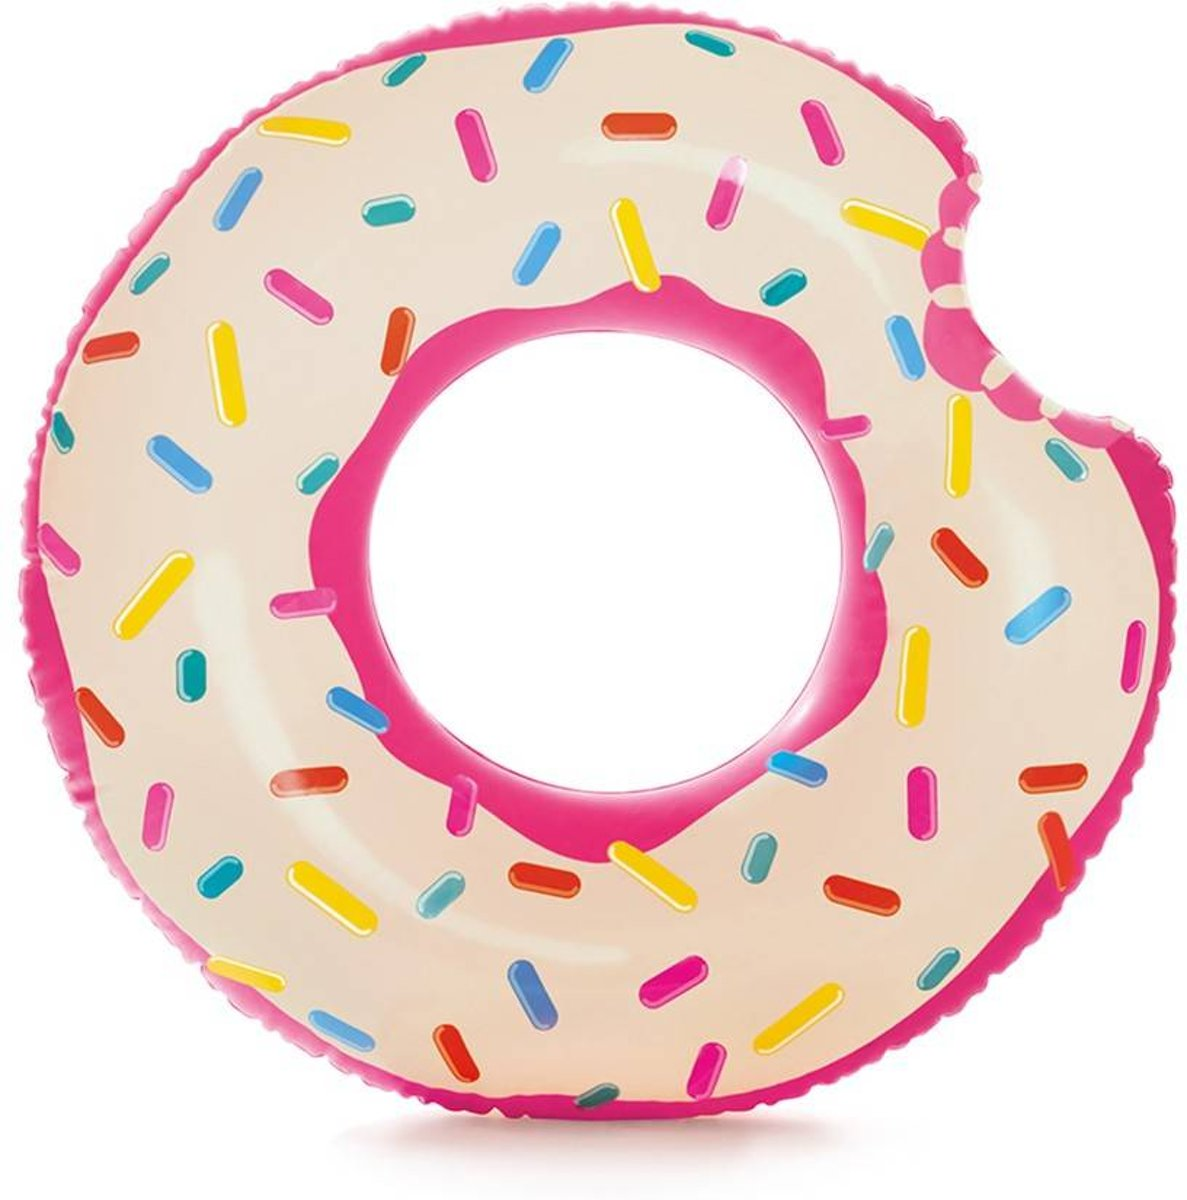 Intex Zwemring Donut Roze 107 cm - Zwemband